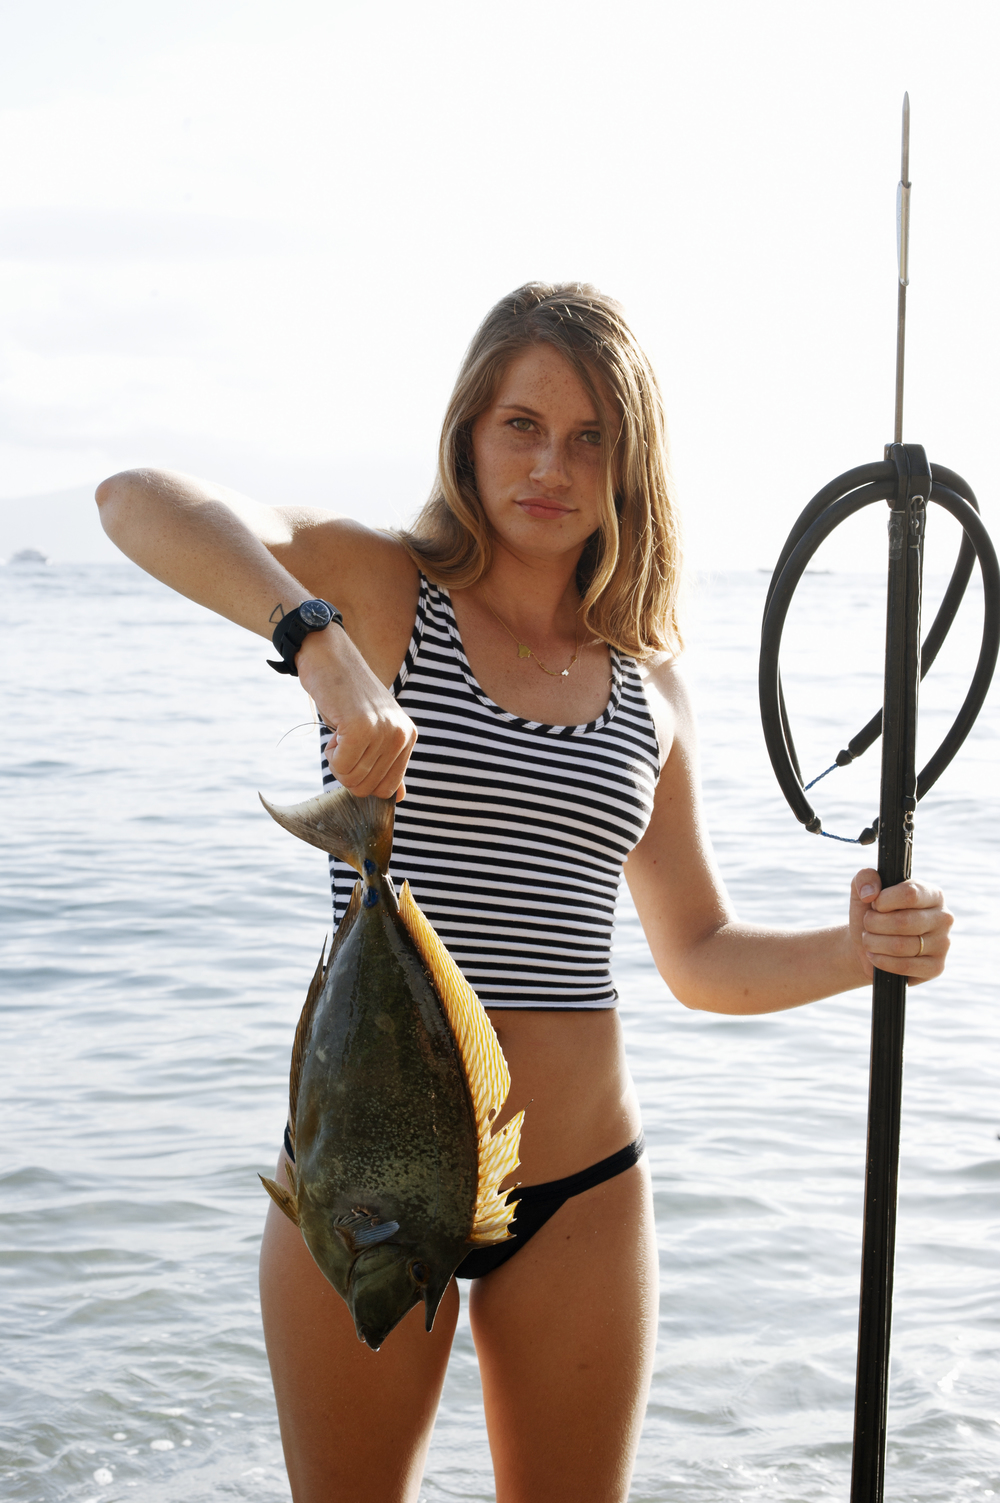 Pics Molly Bennett nudes (35 photo), Ass, Bikini, Selfie, swimsuit 2006